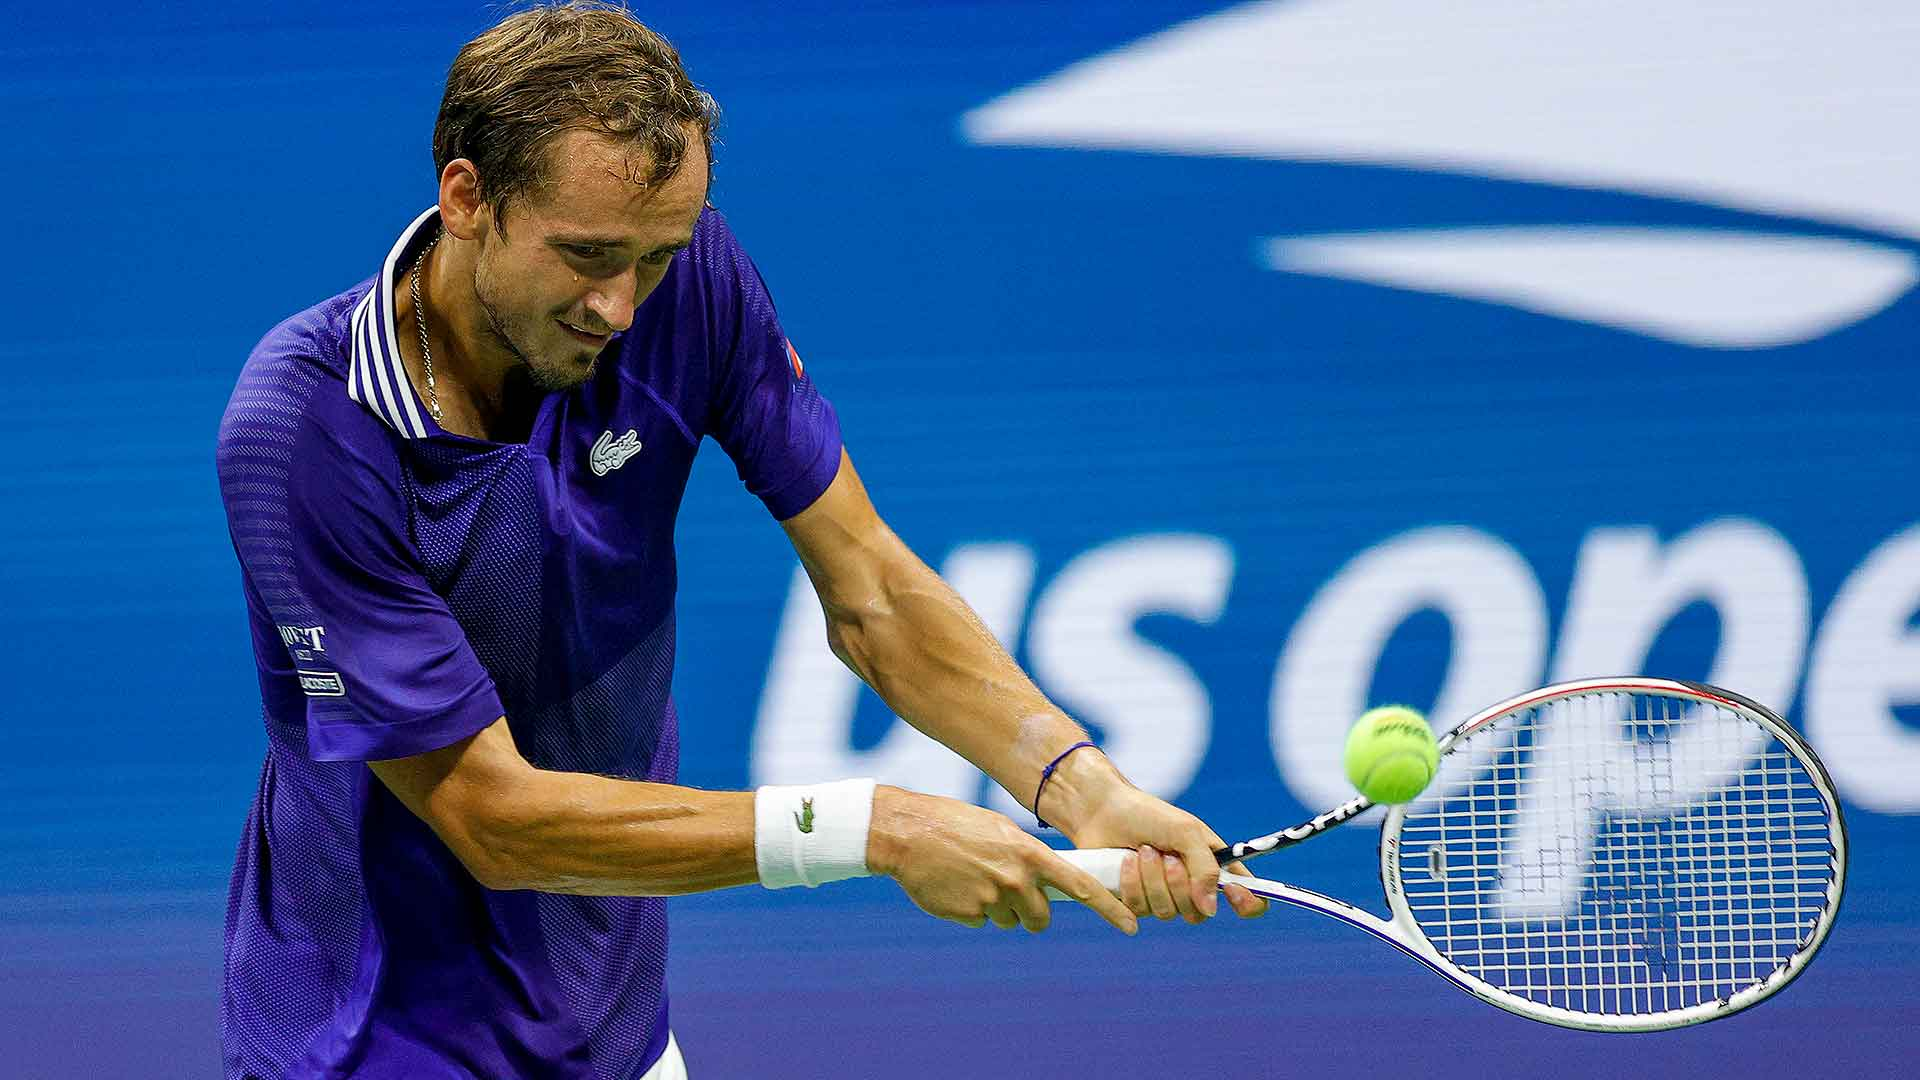 US Open 2021: Daniil Medvedev vs. Dominik Koepfer Tennis Pick and Prediction